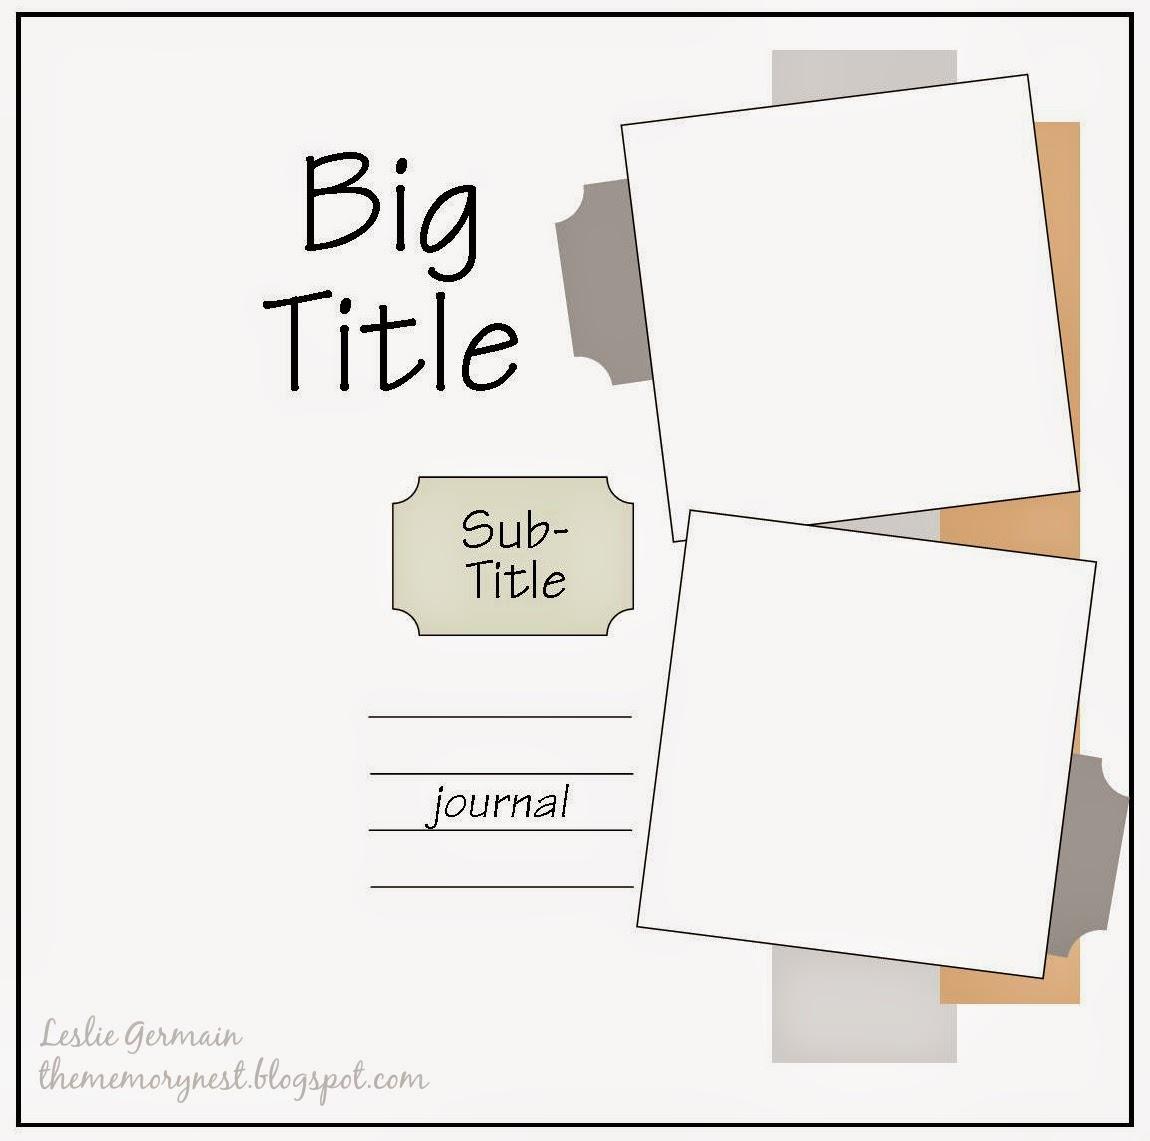 http://thememorynest.blogspot.co.uk/